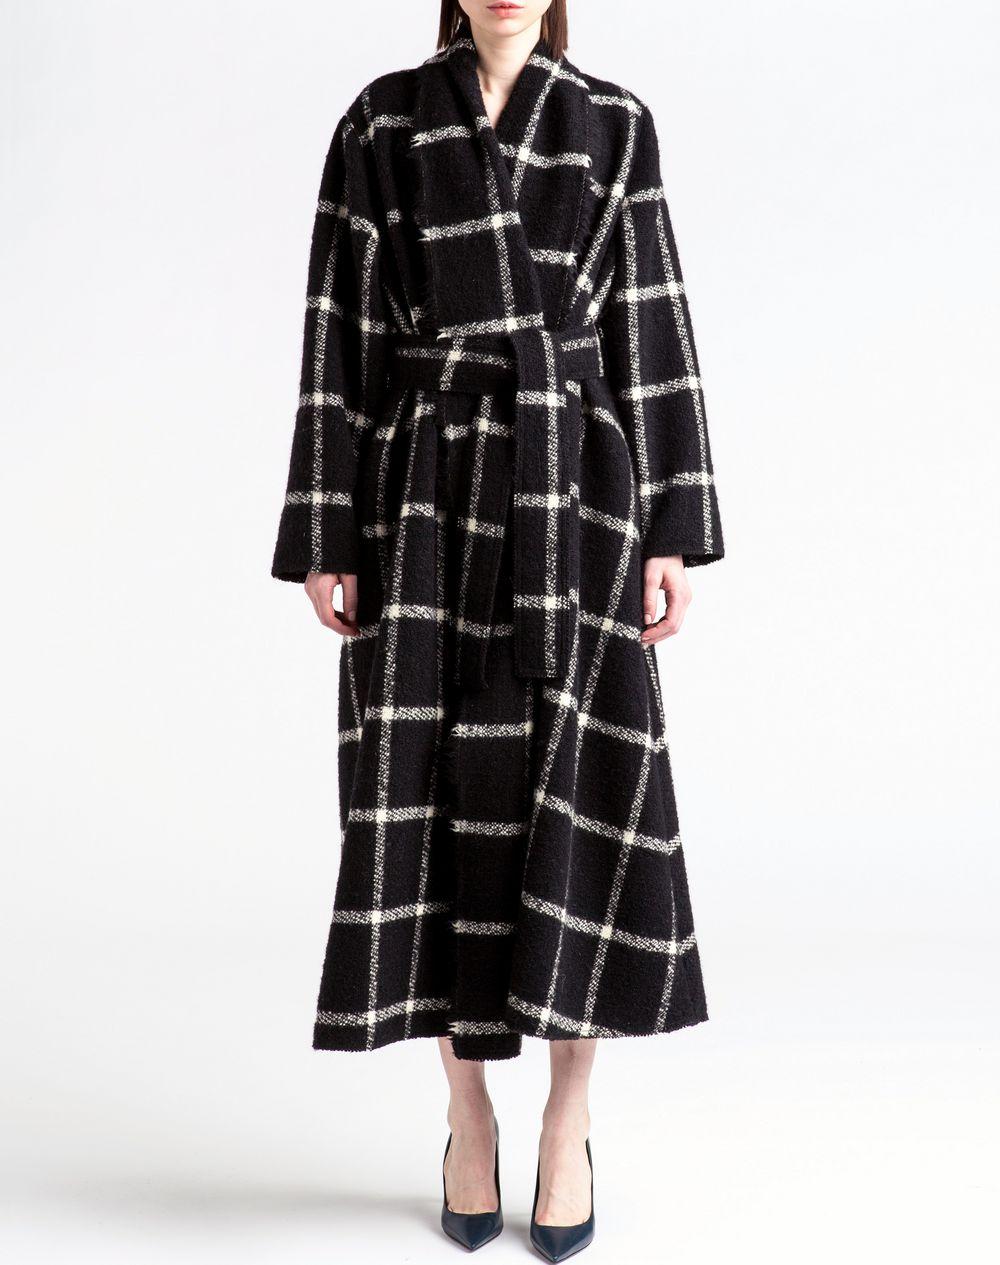 Curled wool coat - Lanvin